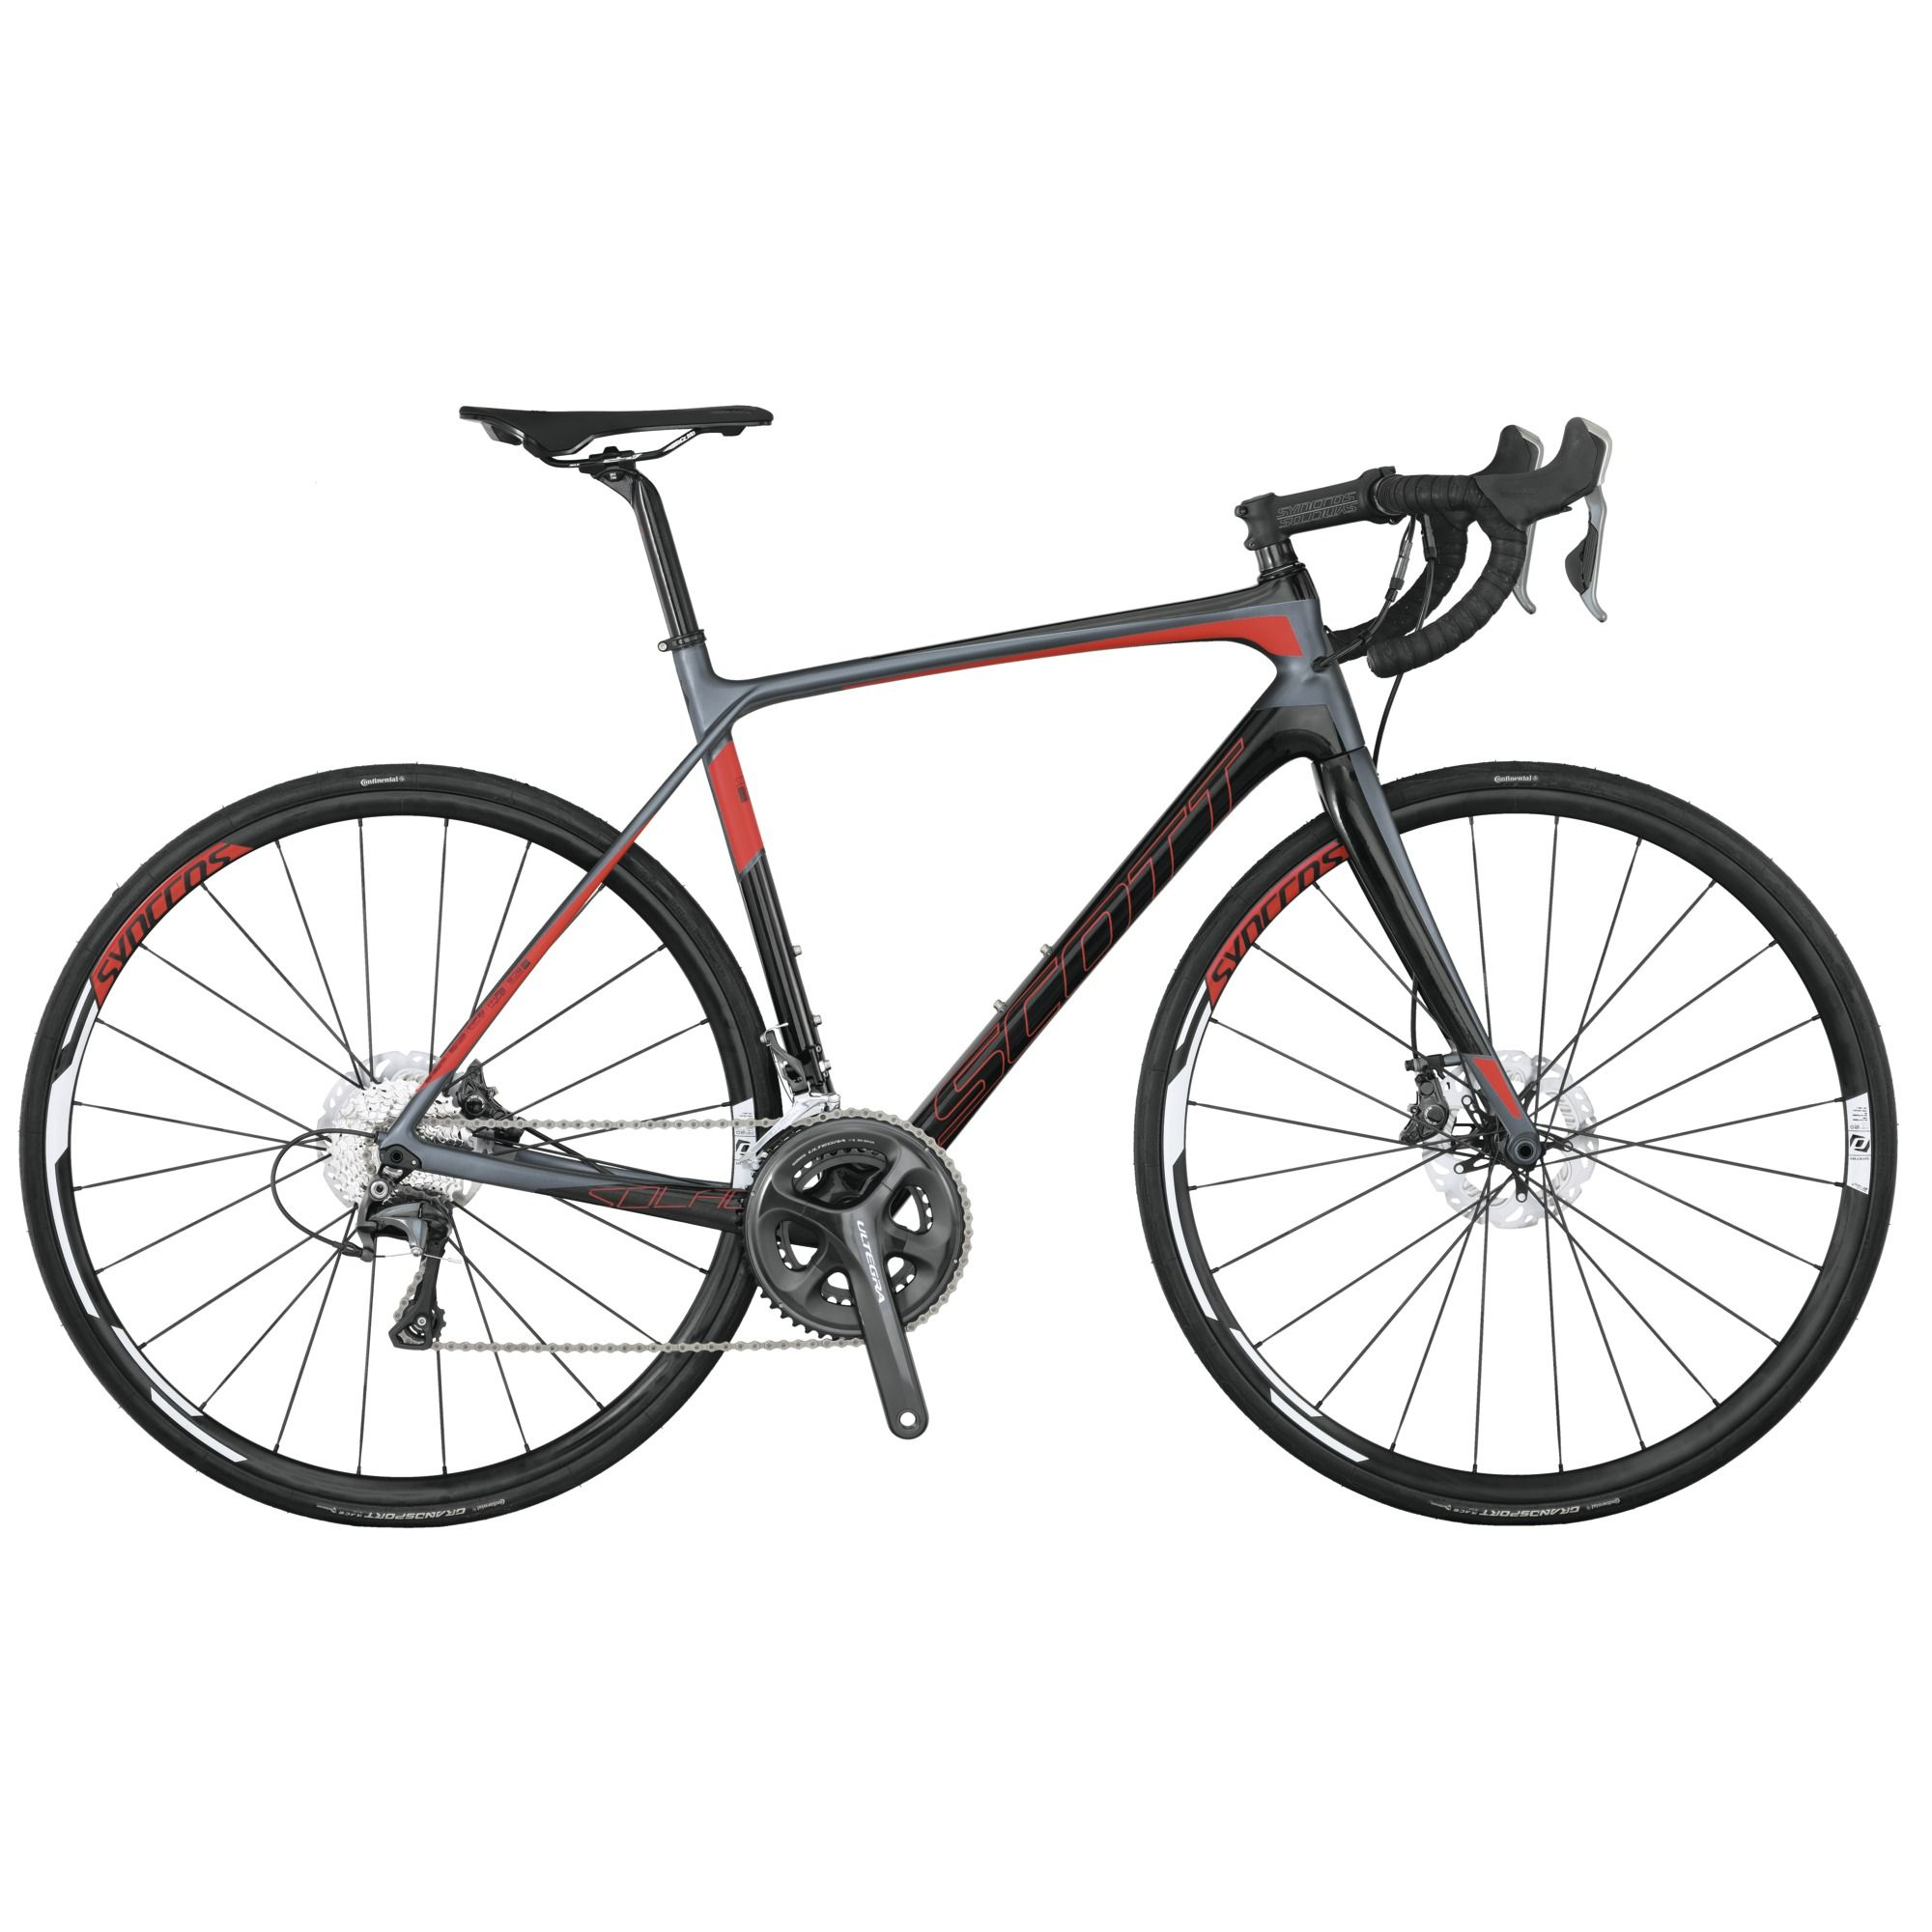 Scott Sports Scott Solace 15 Disc Bike Cyclisme Idees Velo